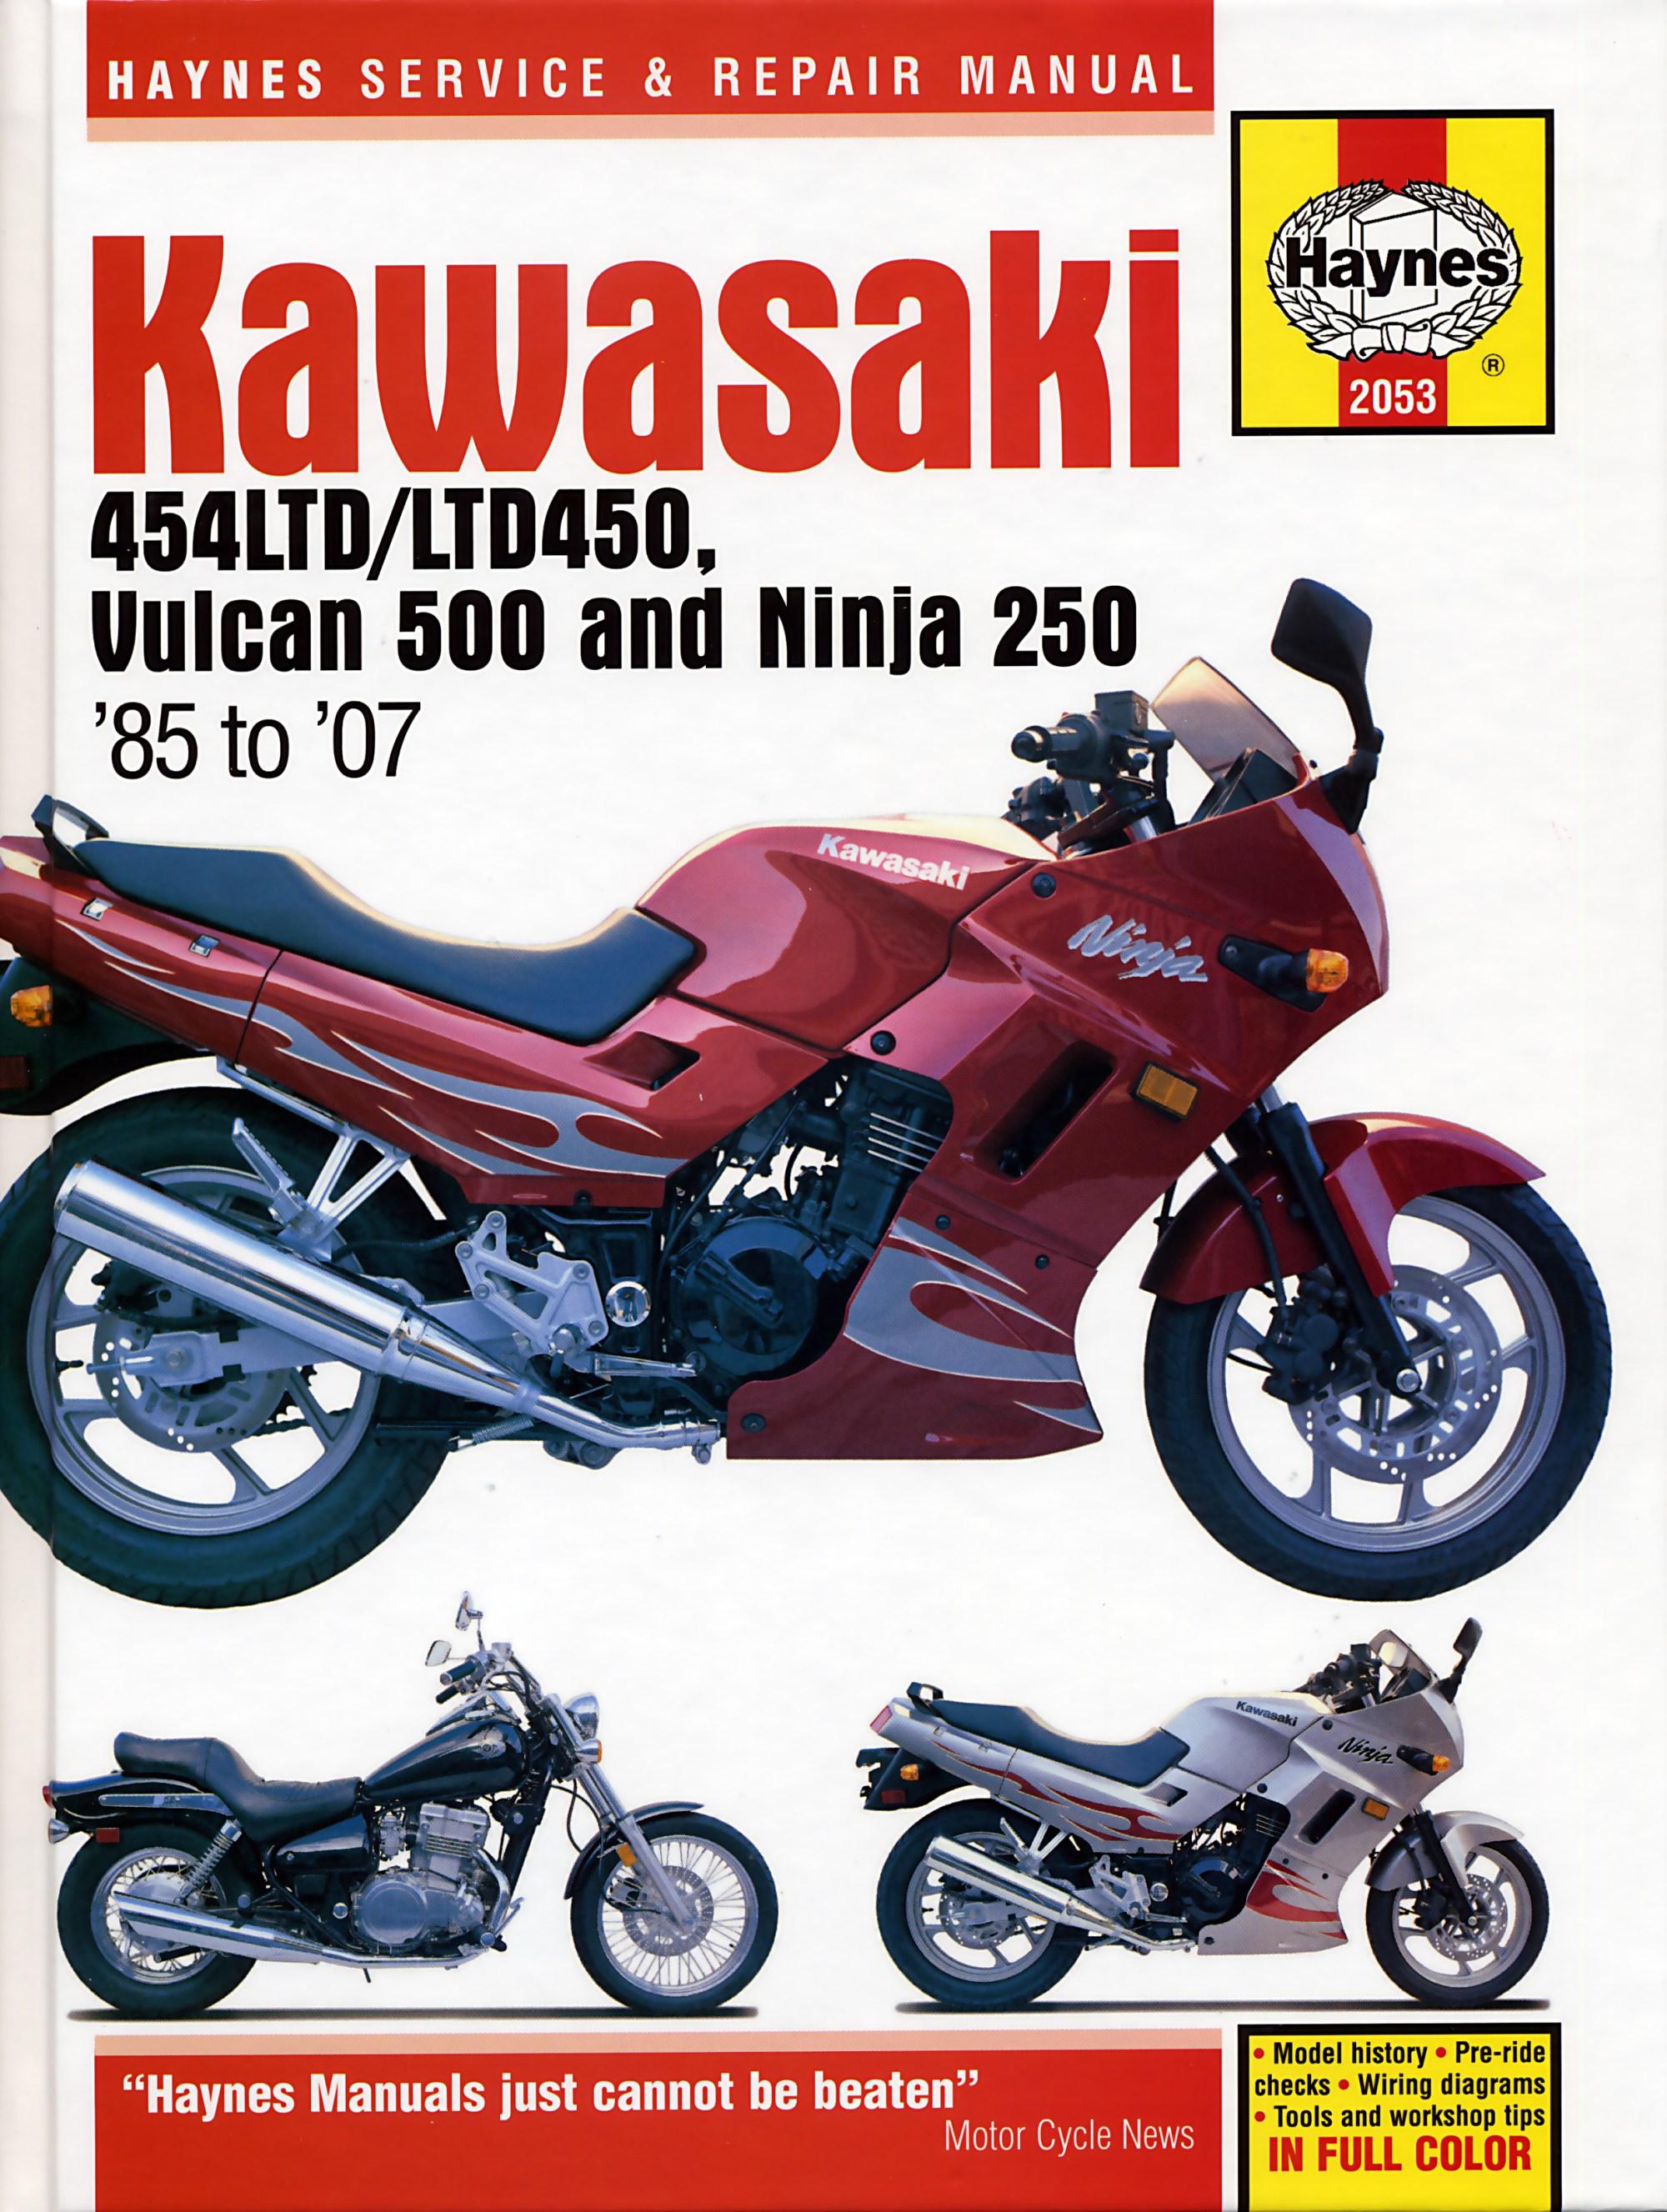 hight resolution of kawasaki 454ltd ltd450 vulcan 500 ninja 250 85 07 haynes repair manual haynes verkstadhanbokhaynes verkstadhanbok wiring diagram